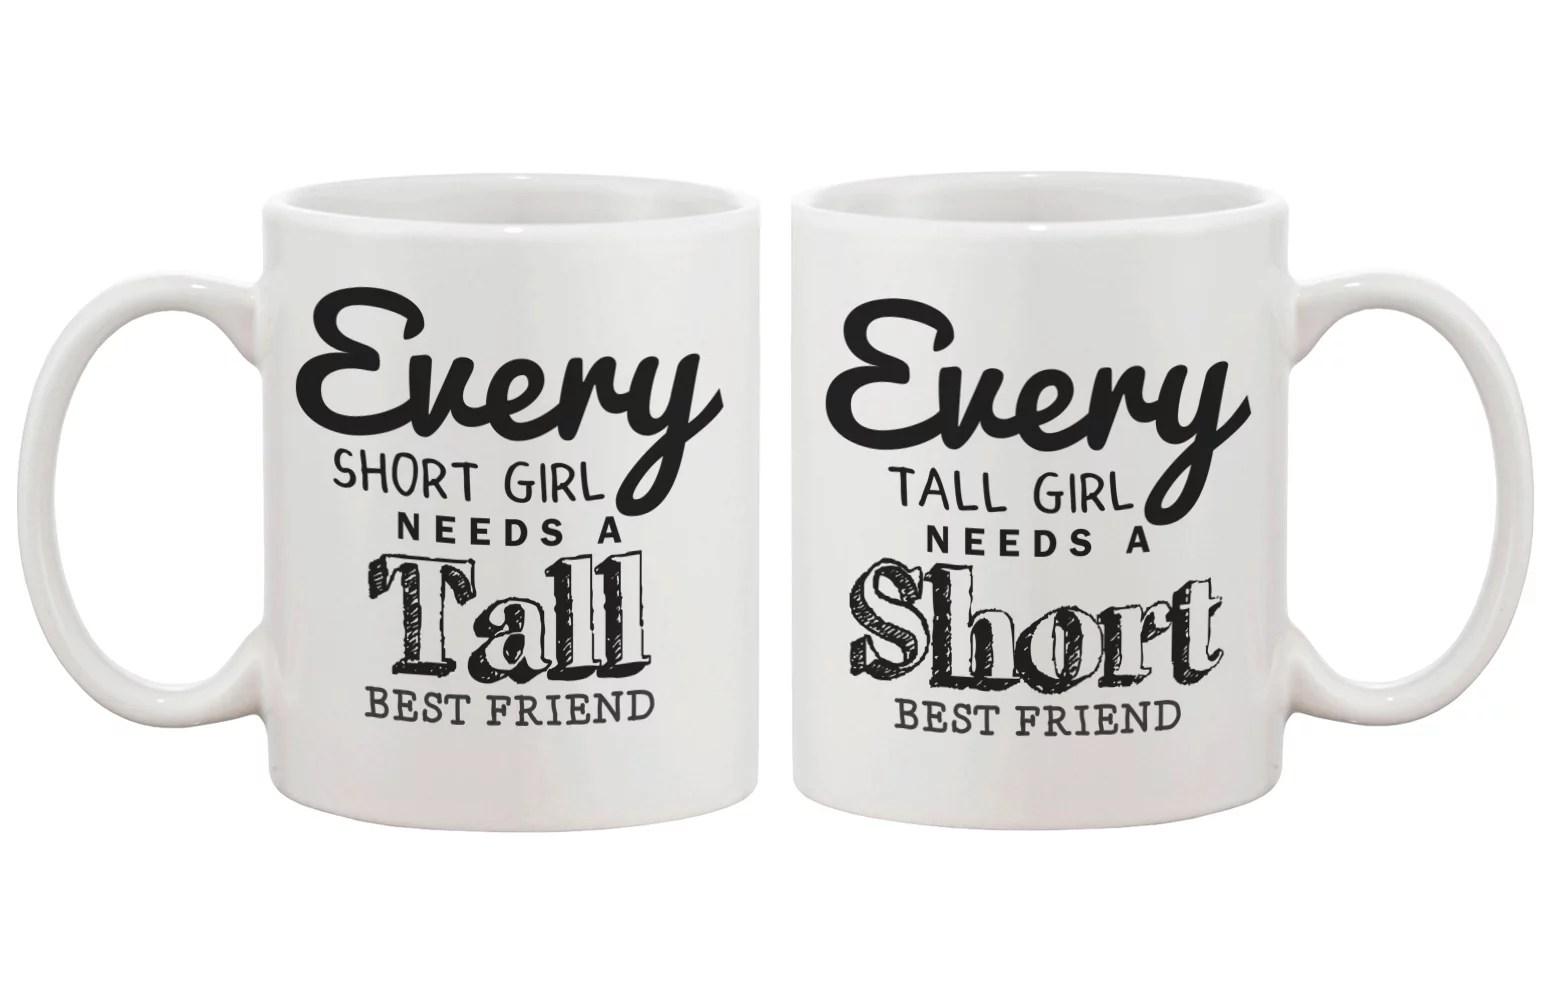 Cute Coffee Mugs For Best Friends Every Short Girl Needs